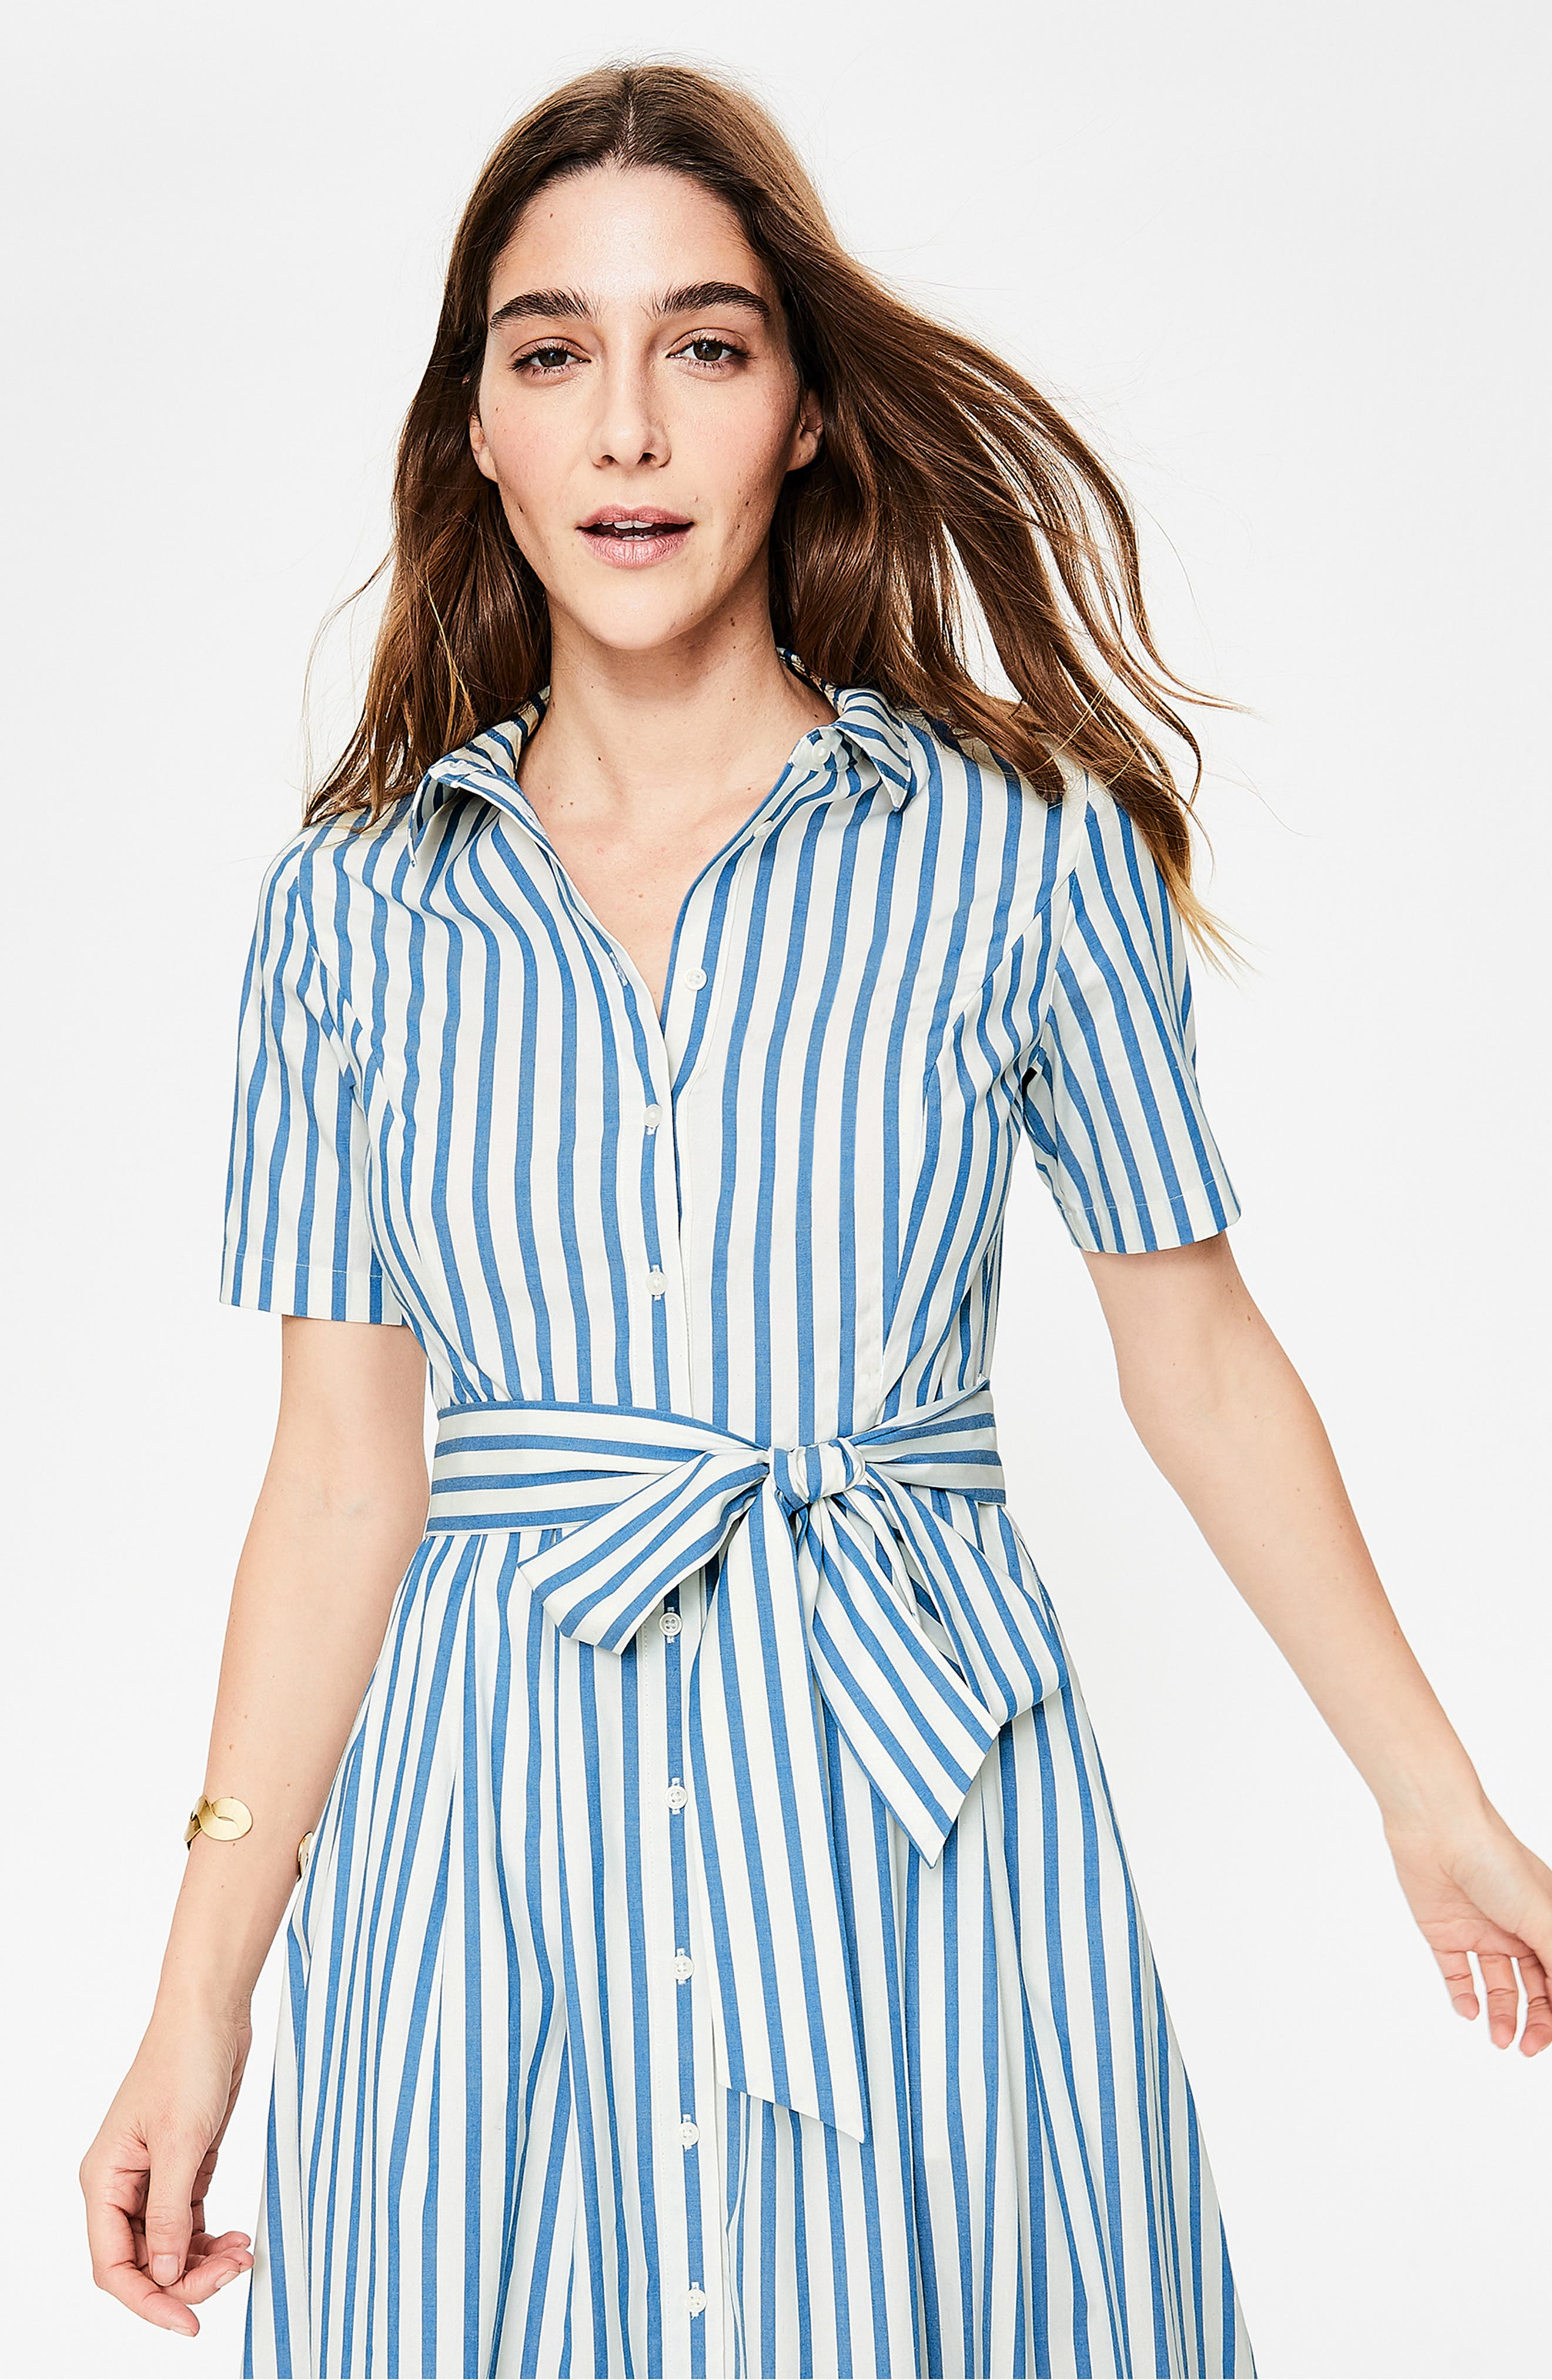 BODEN, Anastasia Tie Front Shirtdress, Alternate thumbnail 4, color, 454